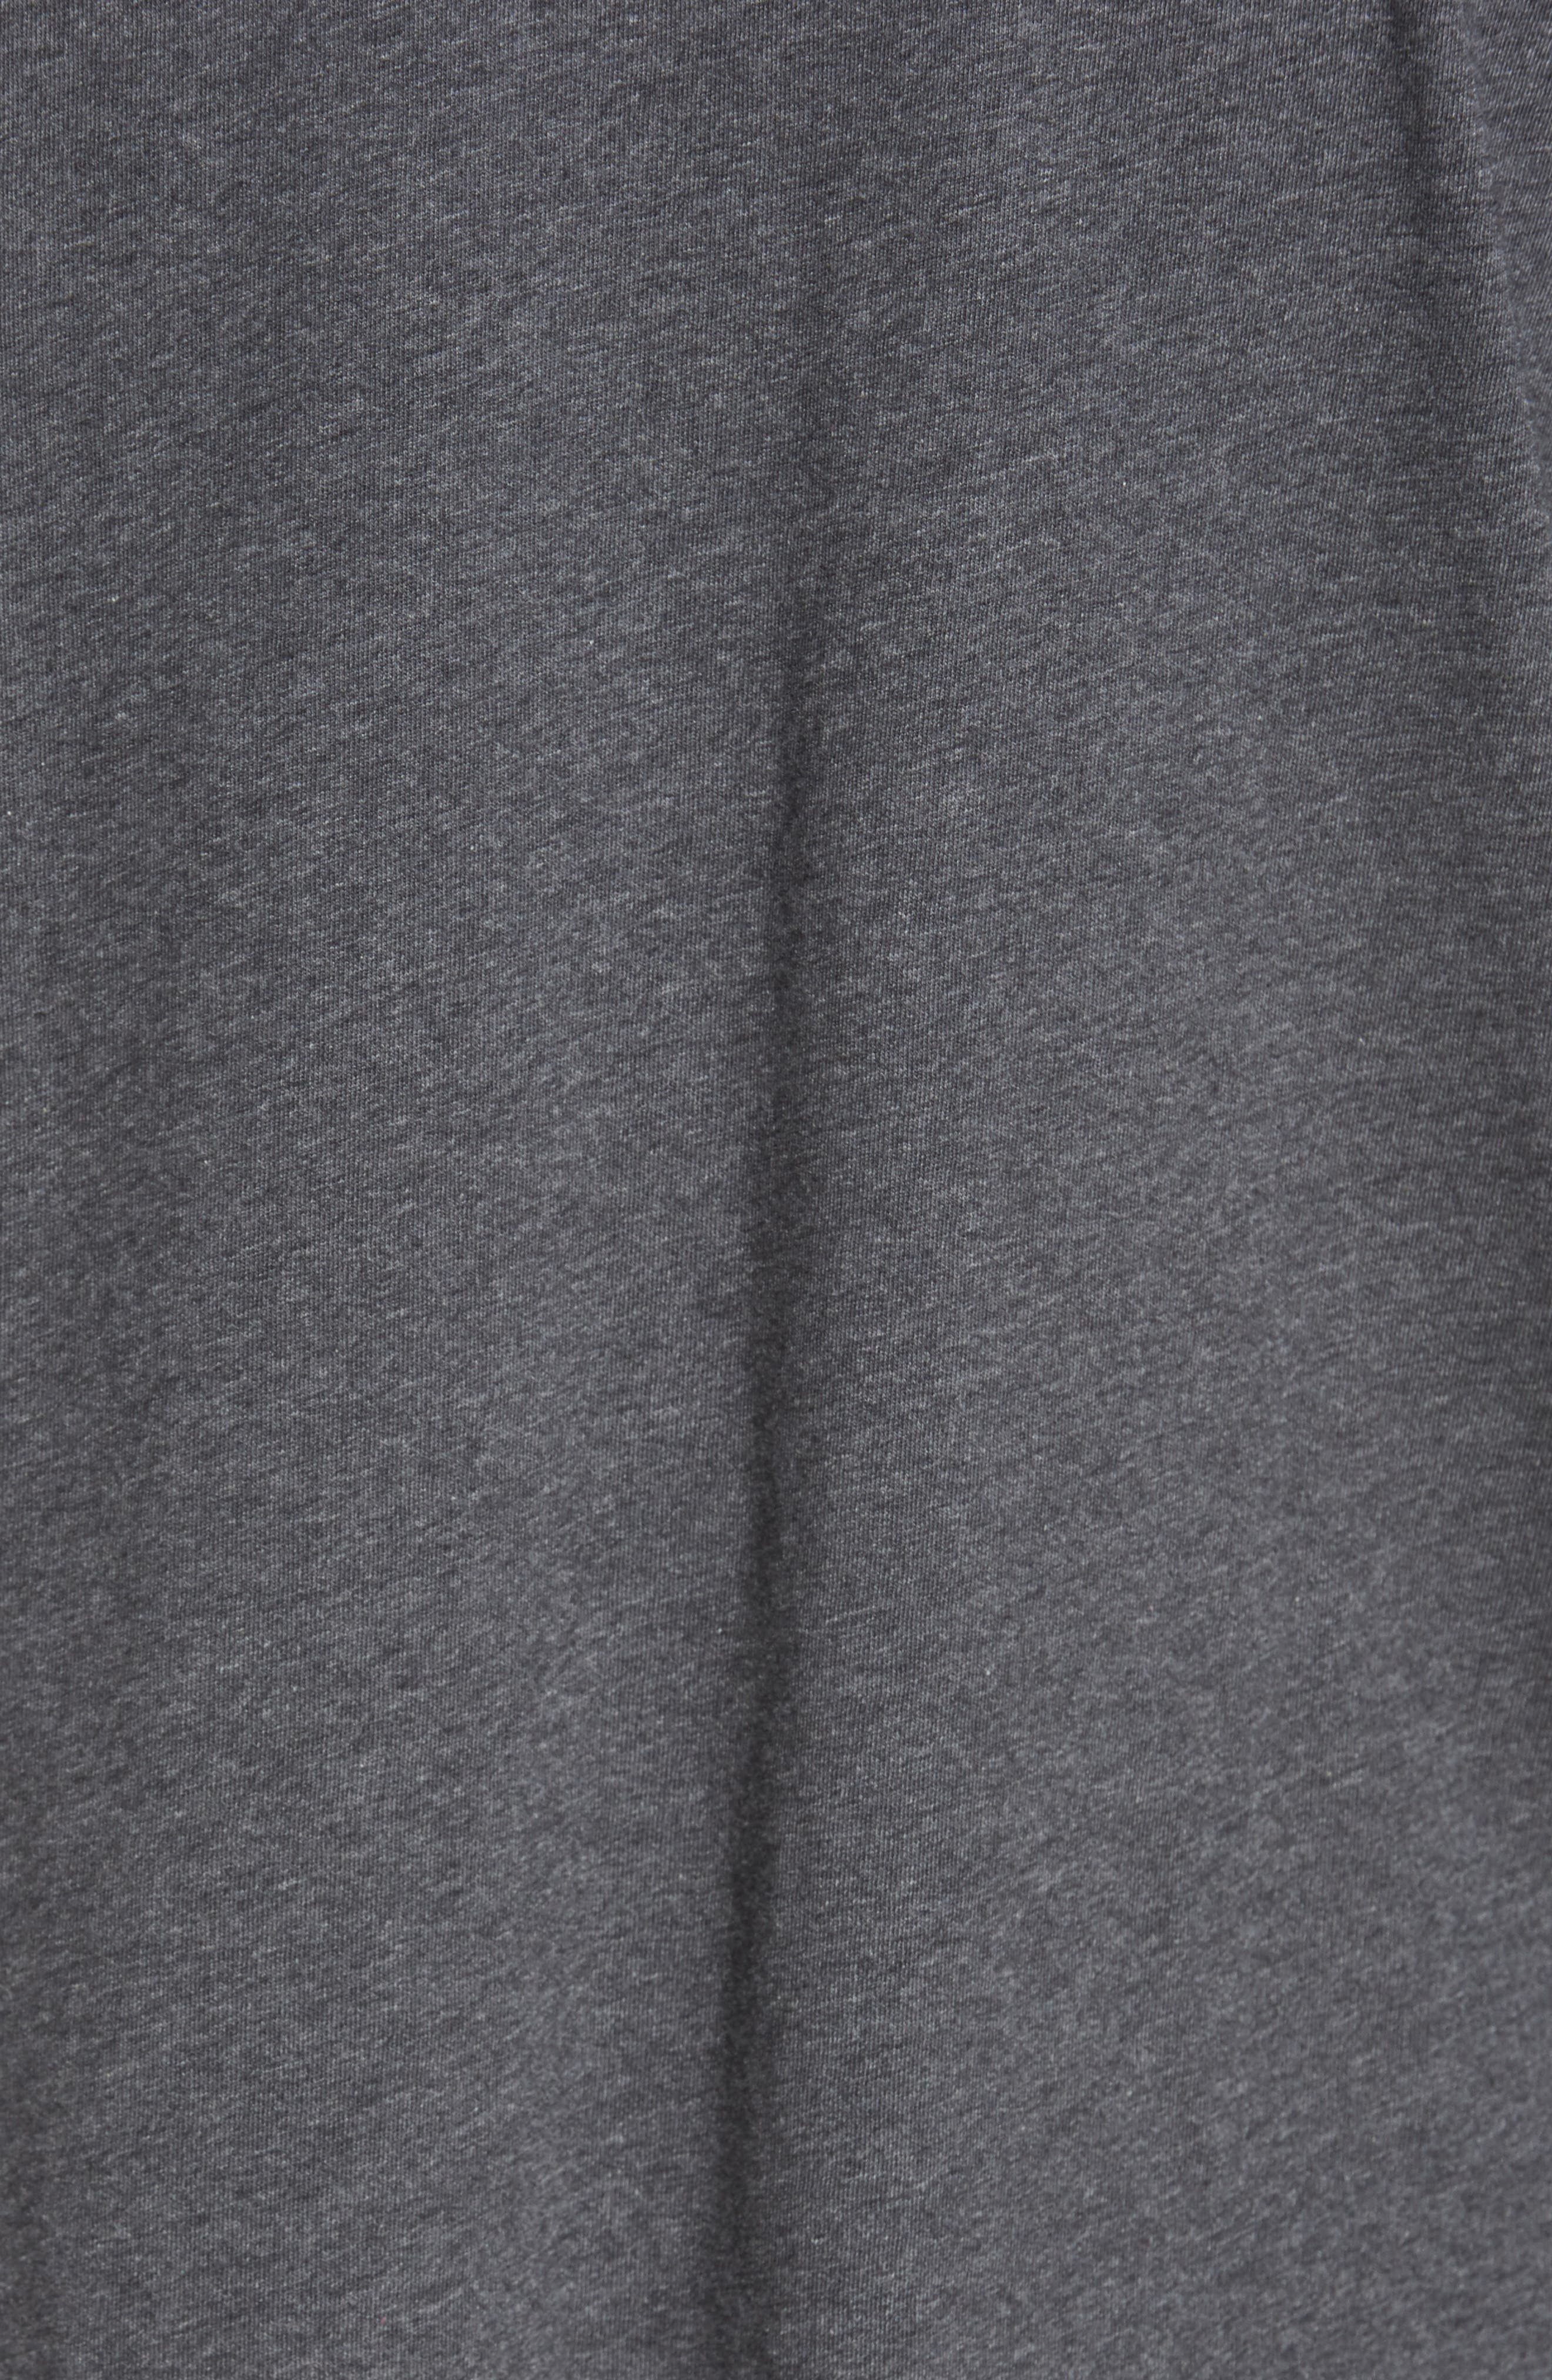 TOMMY BAHAMA, 'New Bali Sky' Original Fit Crewneck Pocket T-Shirt, Alternate thumbnail 5, color, CHARCOAL HEATHER